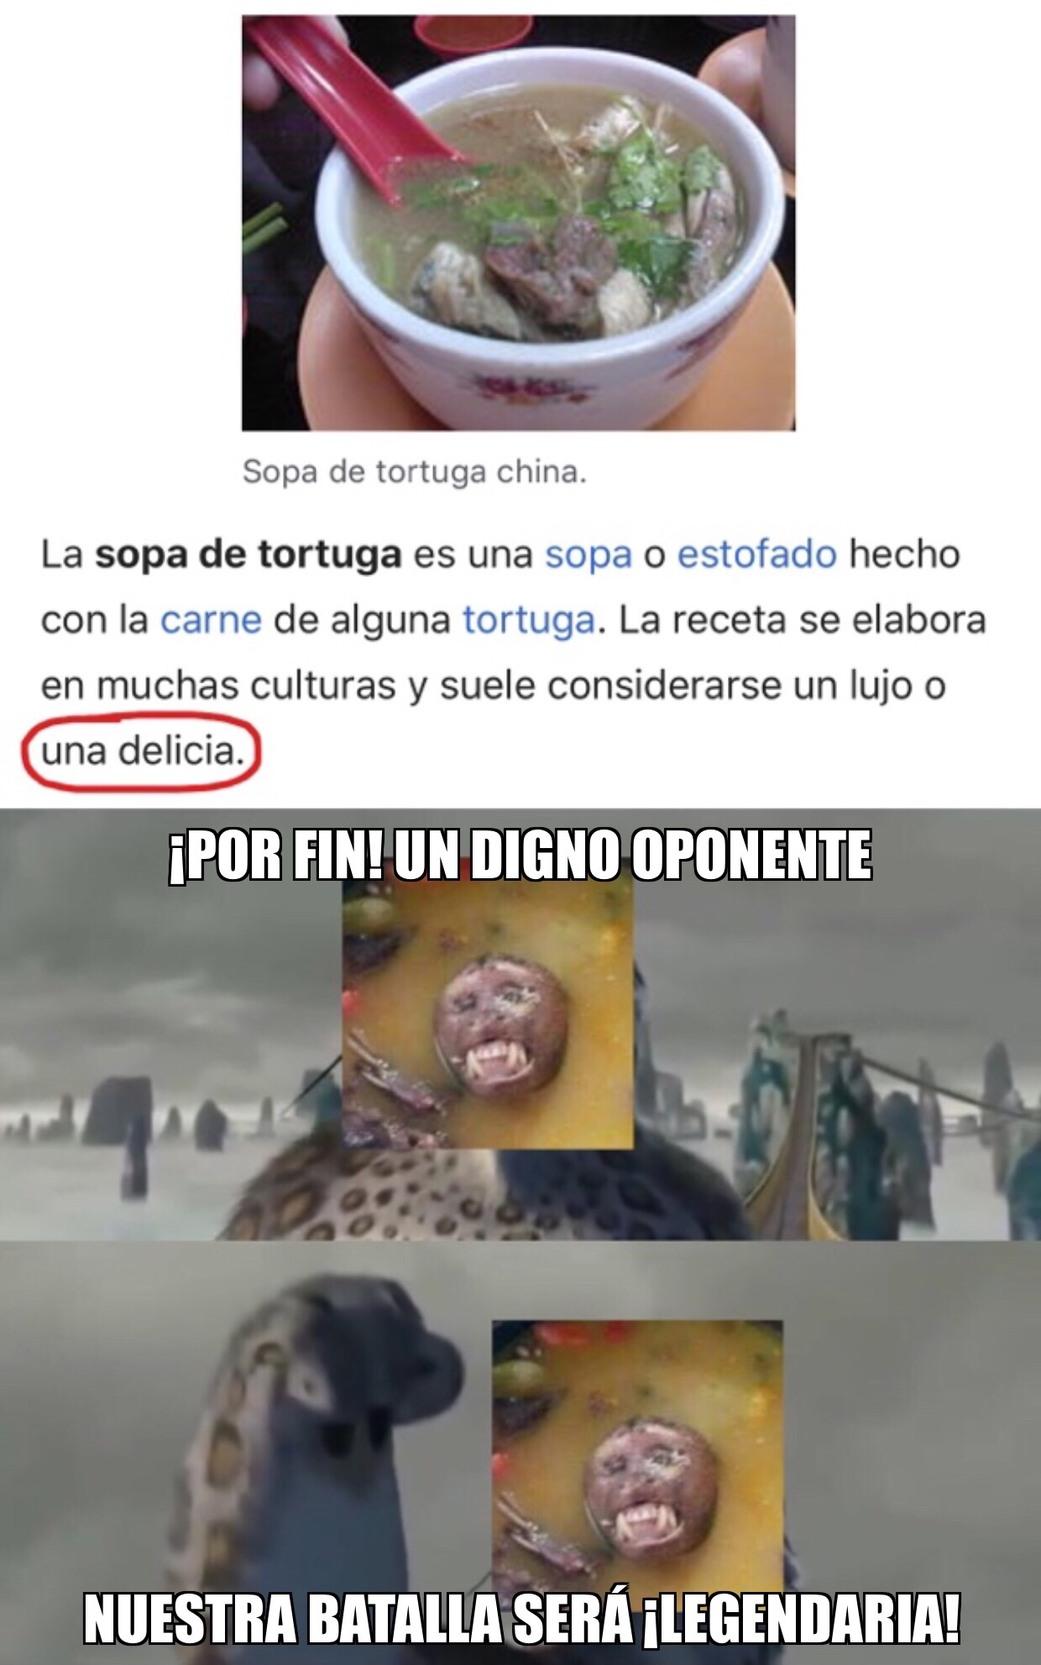 Sopa de Tortuga Una Delicia - meme